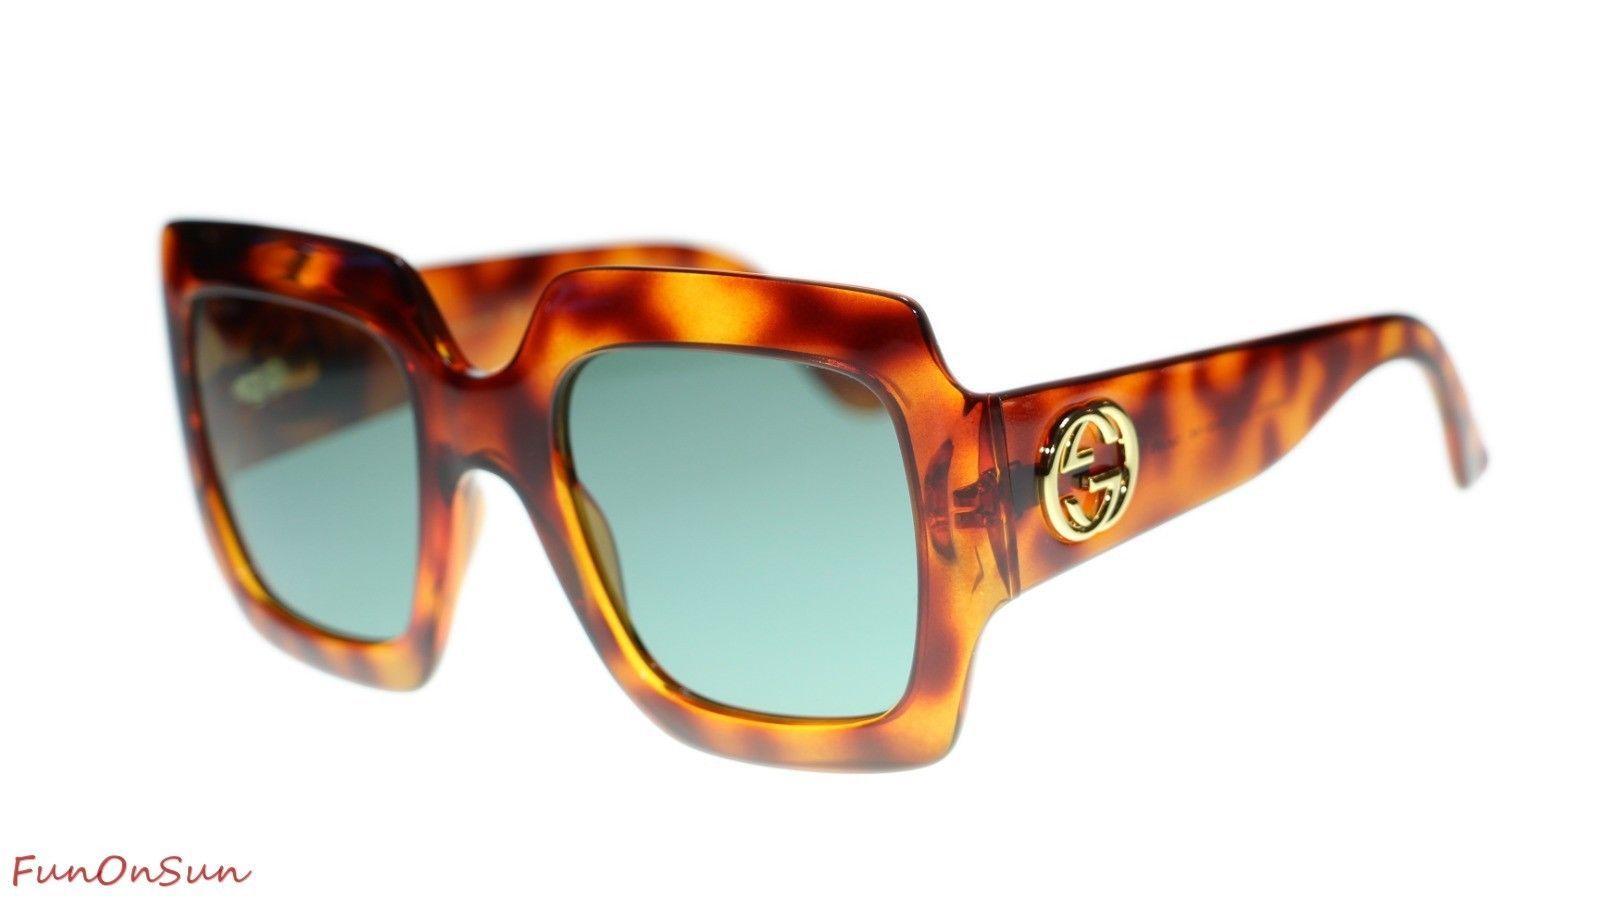 bd47aa1a55a 10. 10. Previous. Gucci Women s Sunglasses GG0053S 002 Havana Green Lens  Square 54mm